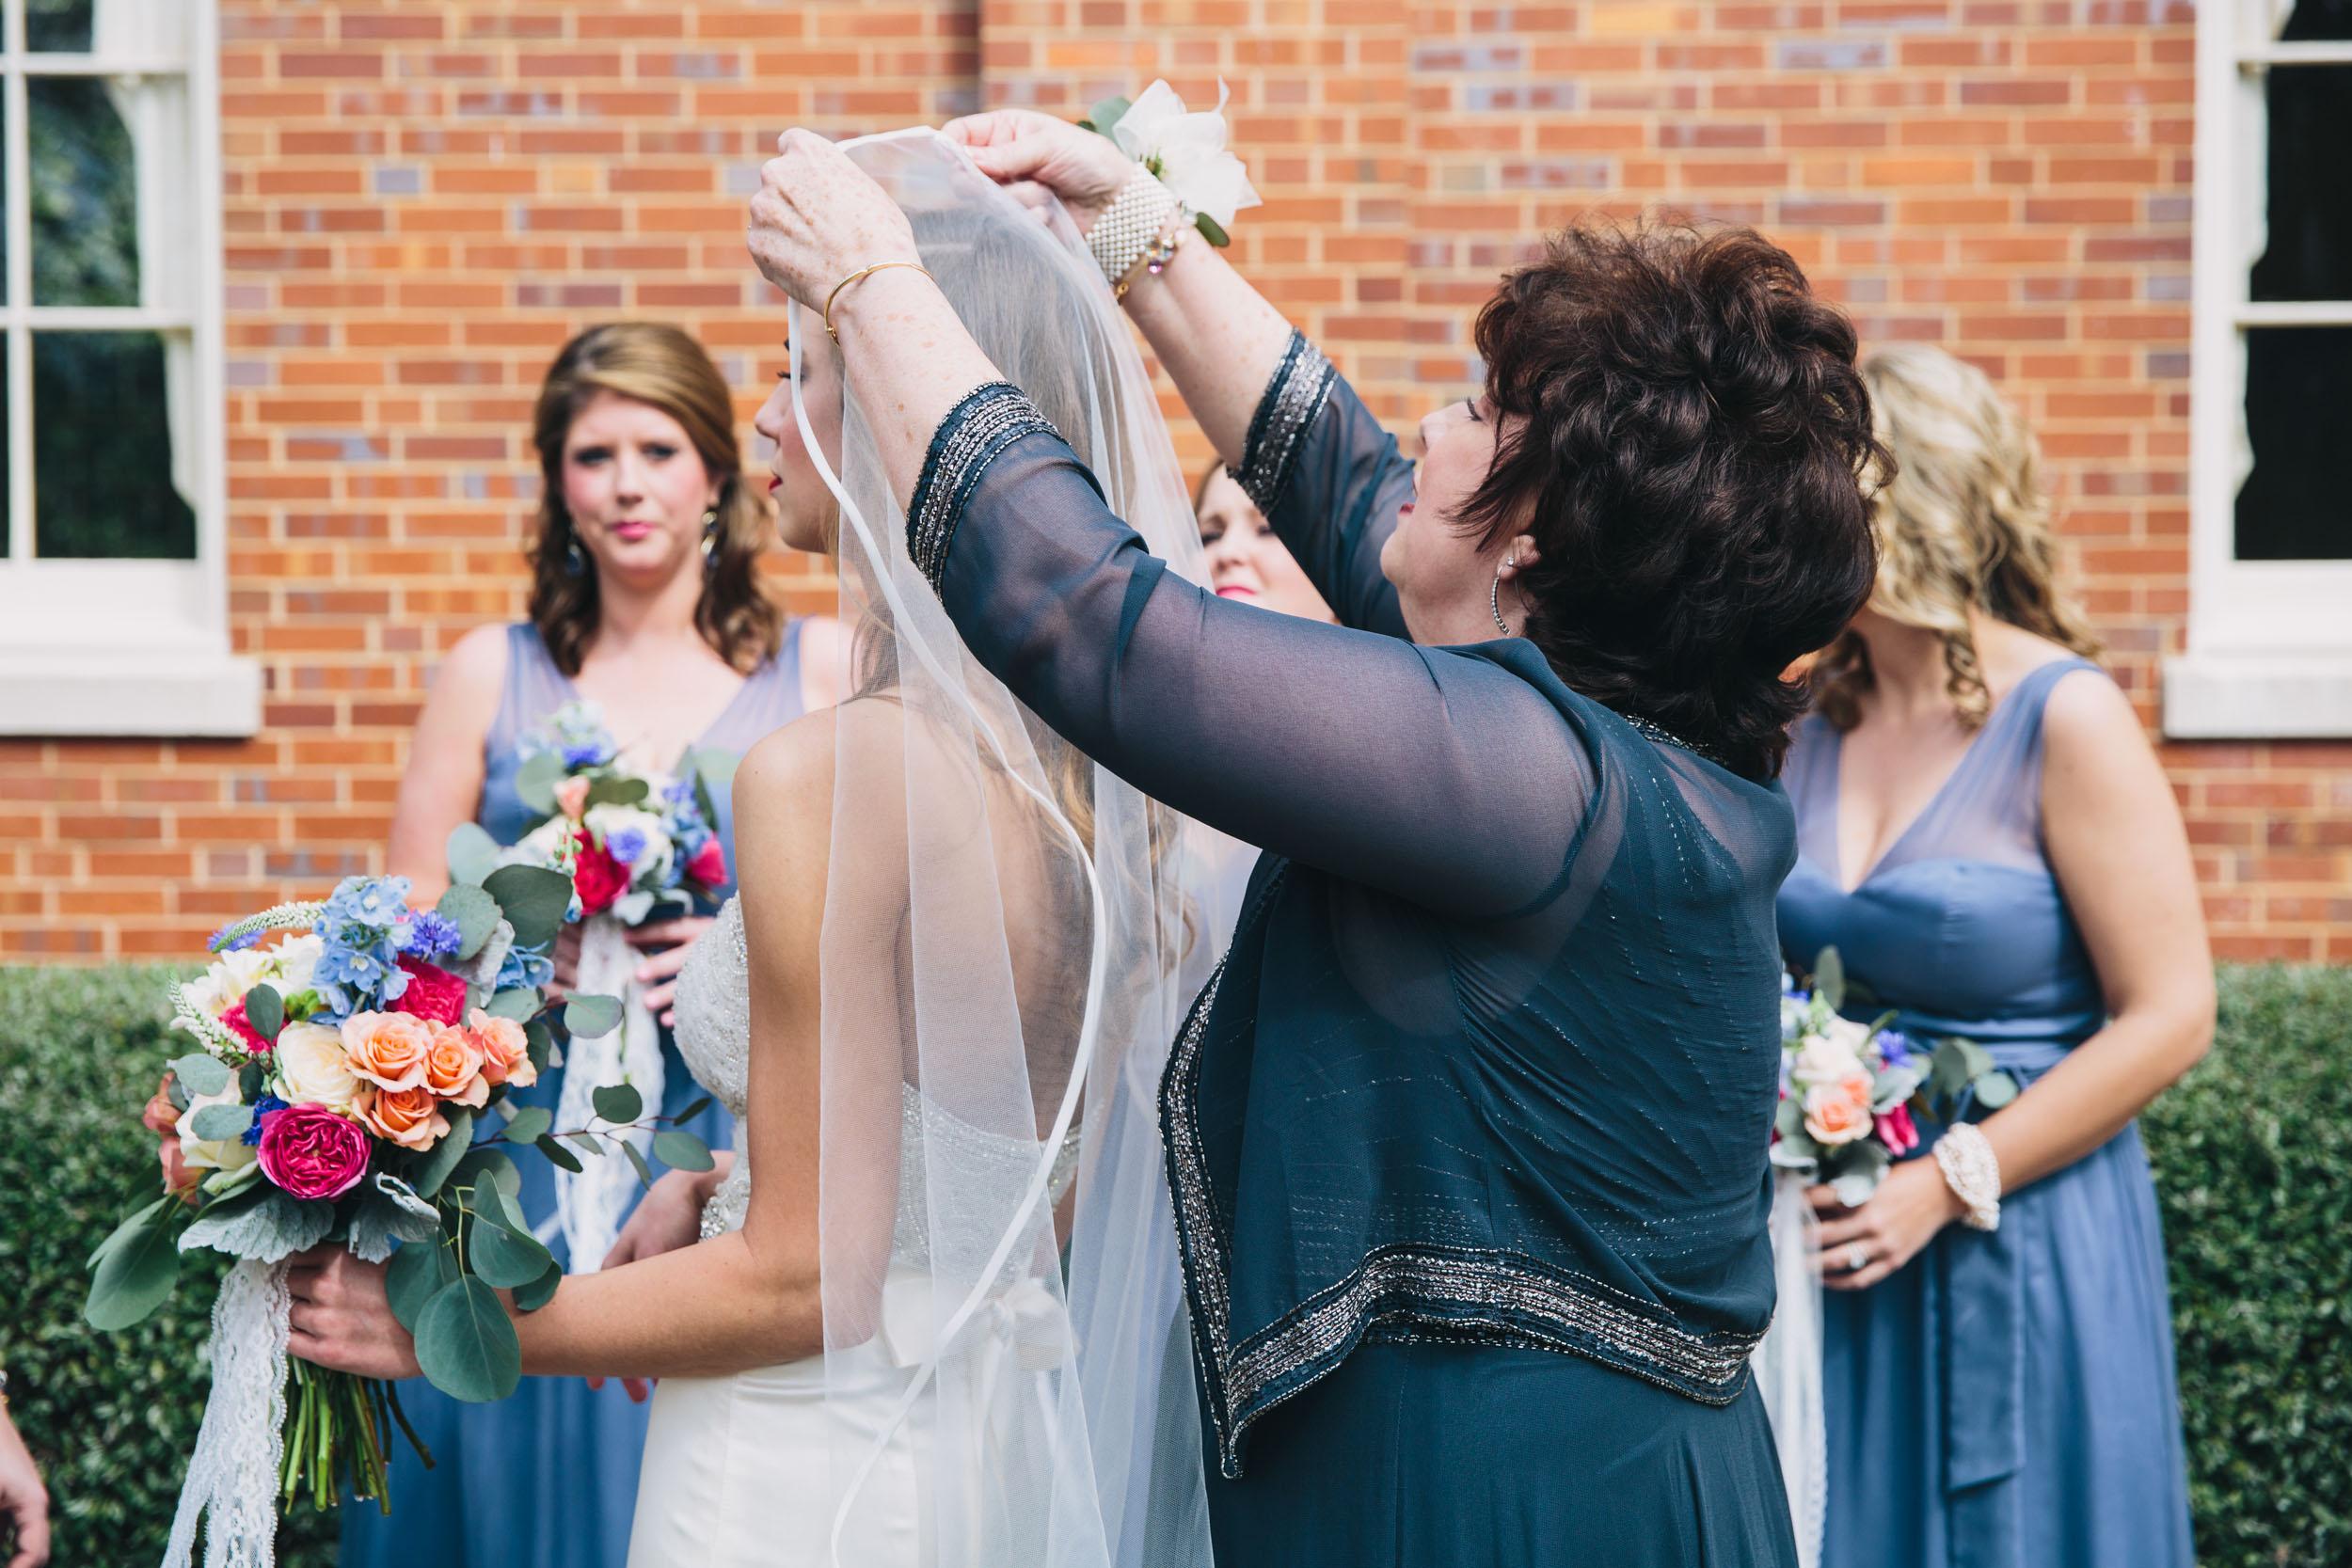 jimmy-rowalt-atlanta-wedding-photography-018.jpg